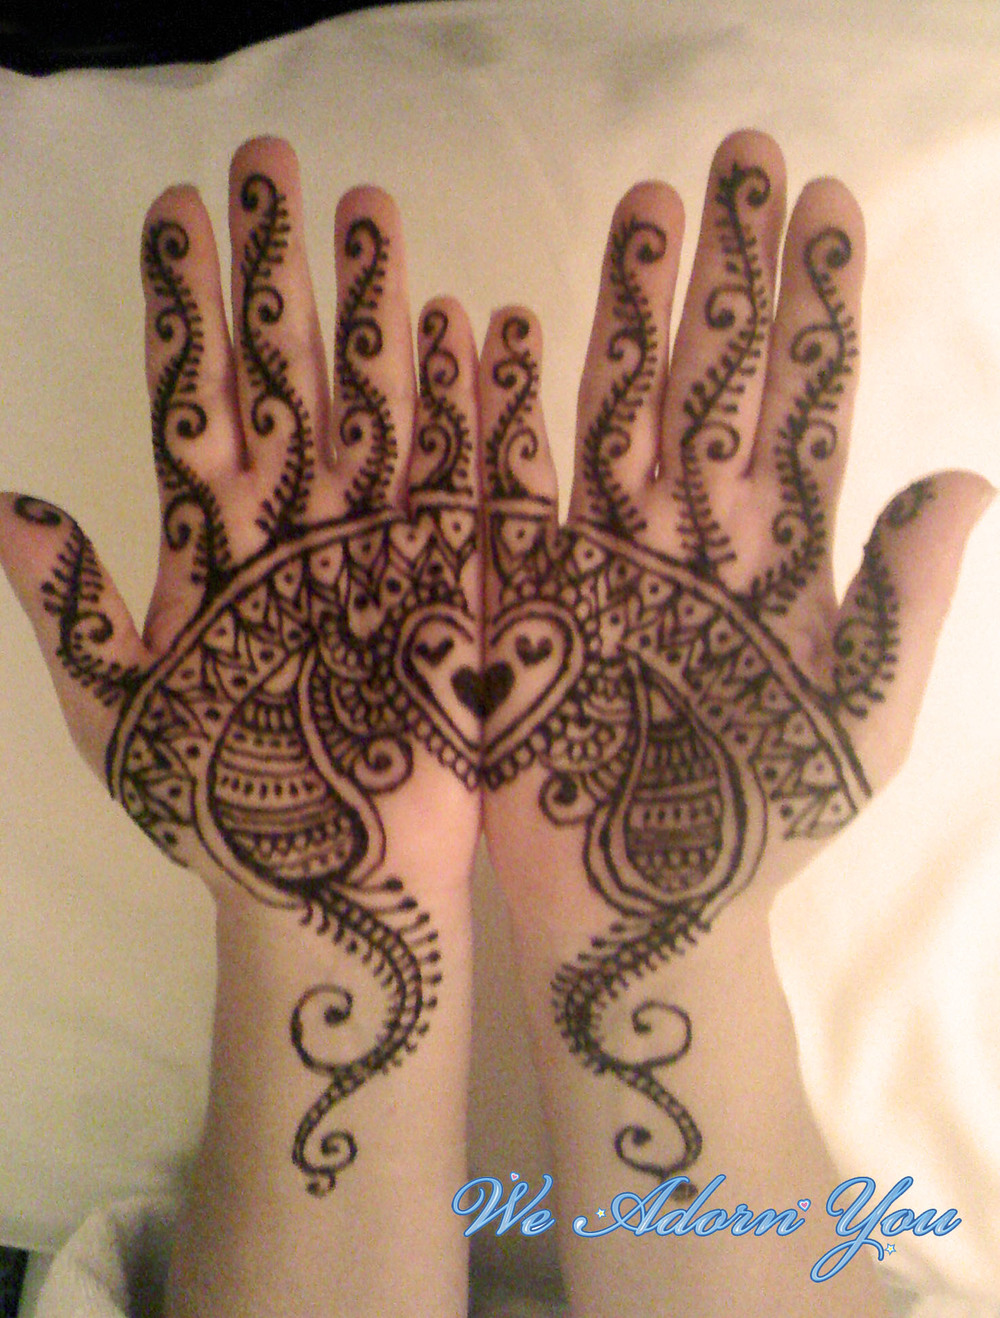 Henna Hand - We Adorn You.jpg